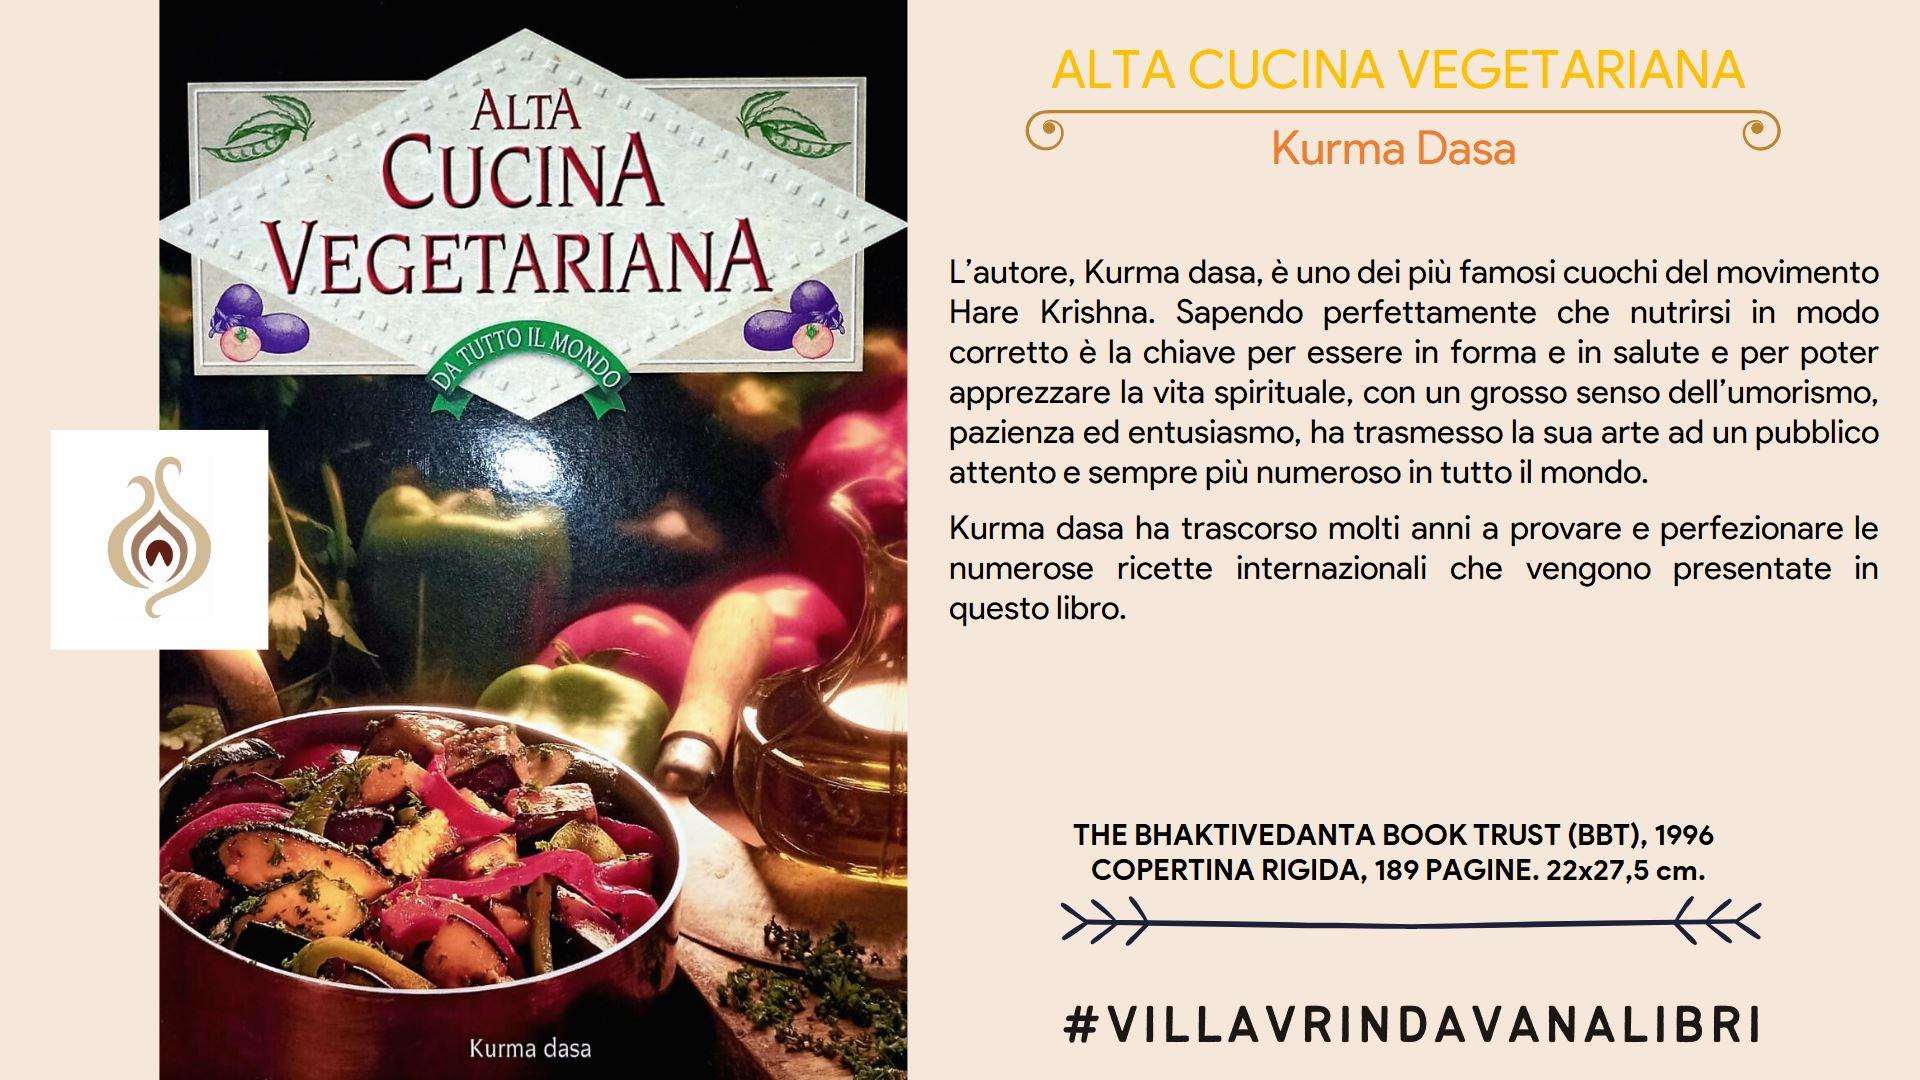 Alta cucina vegetariana